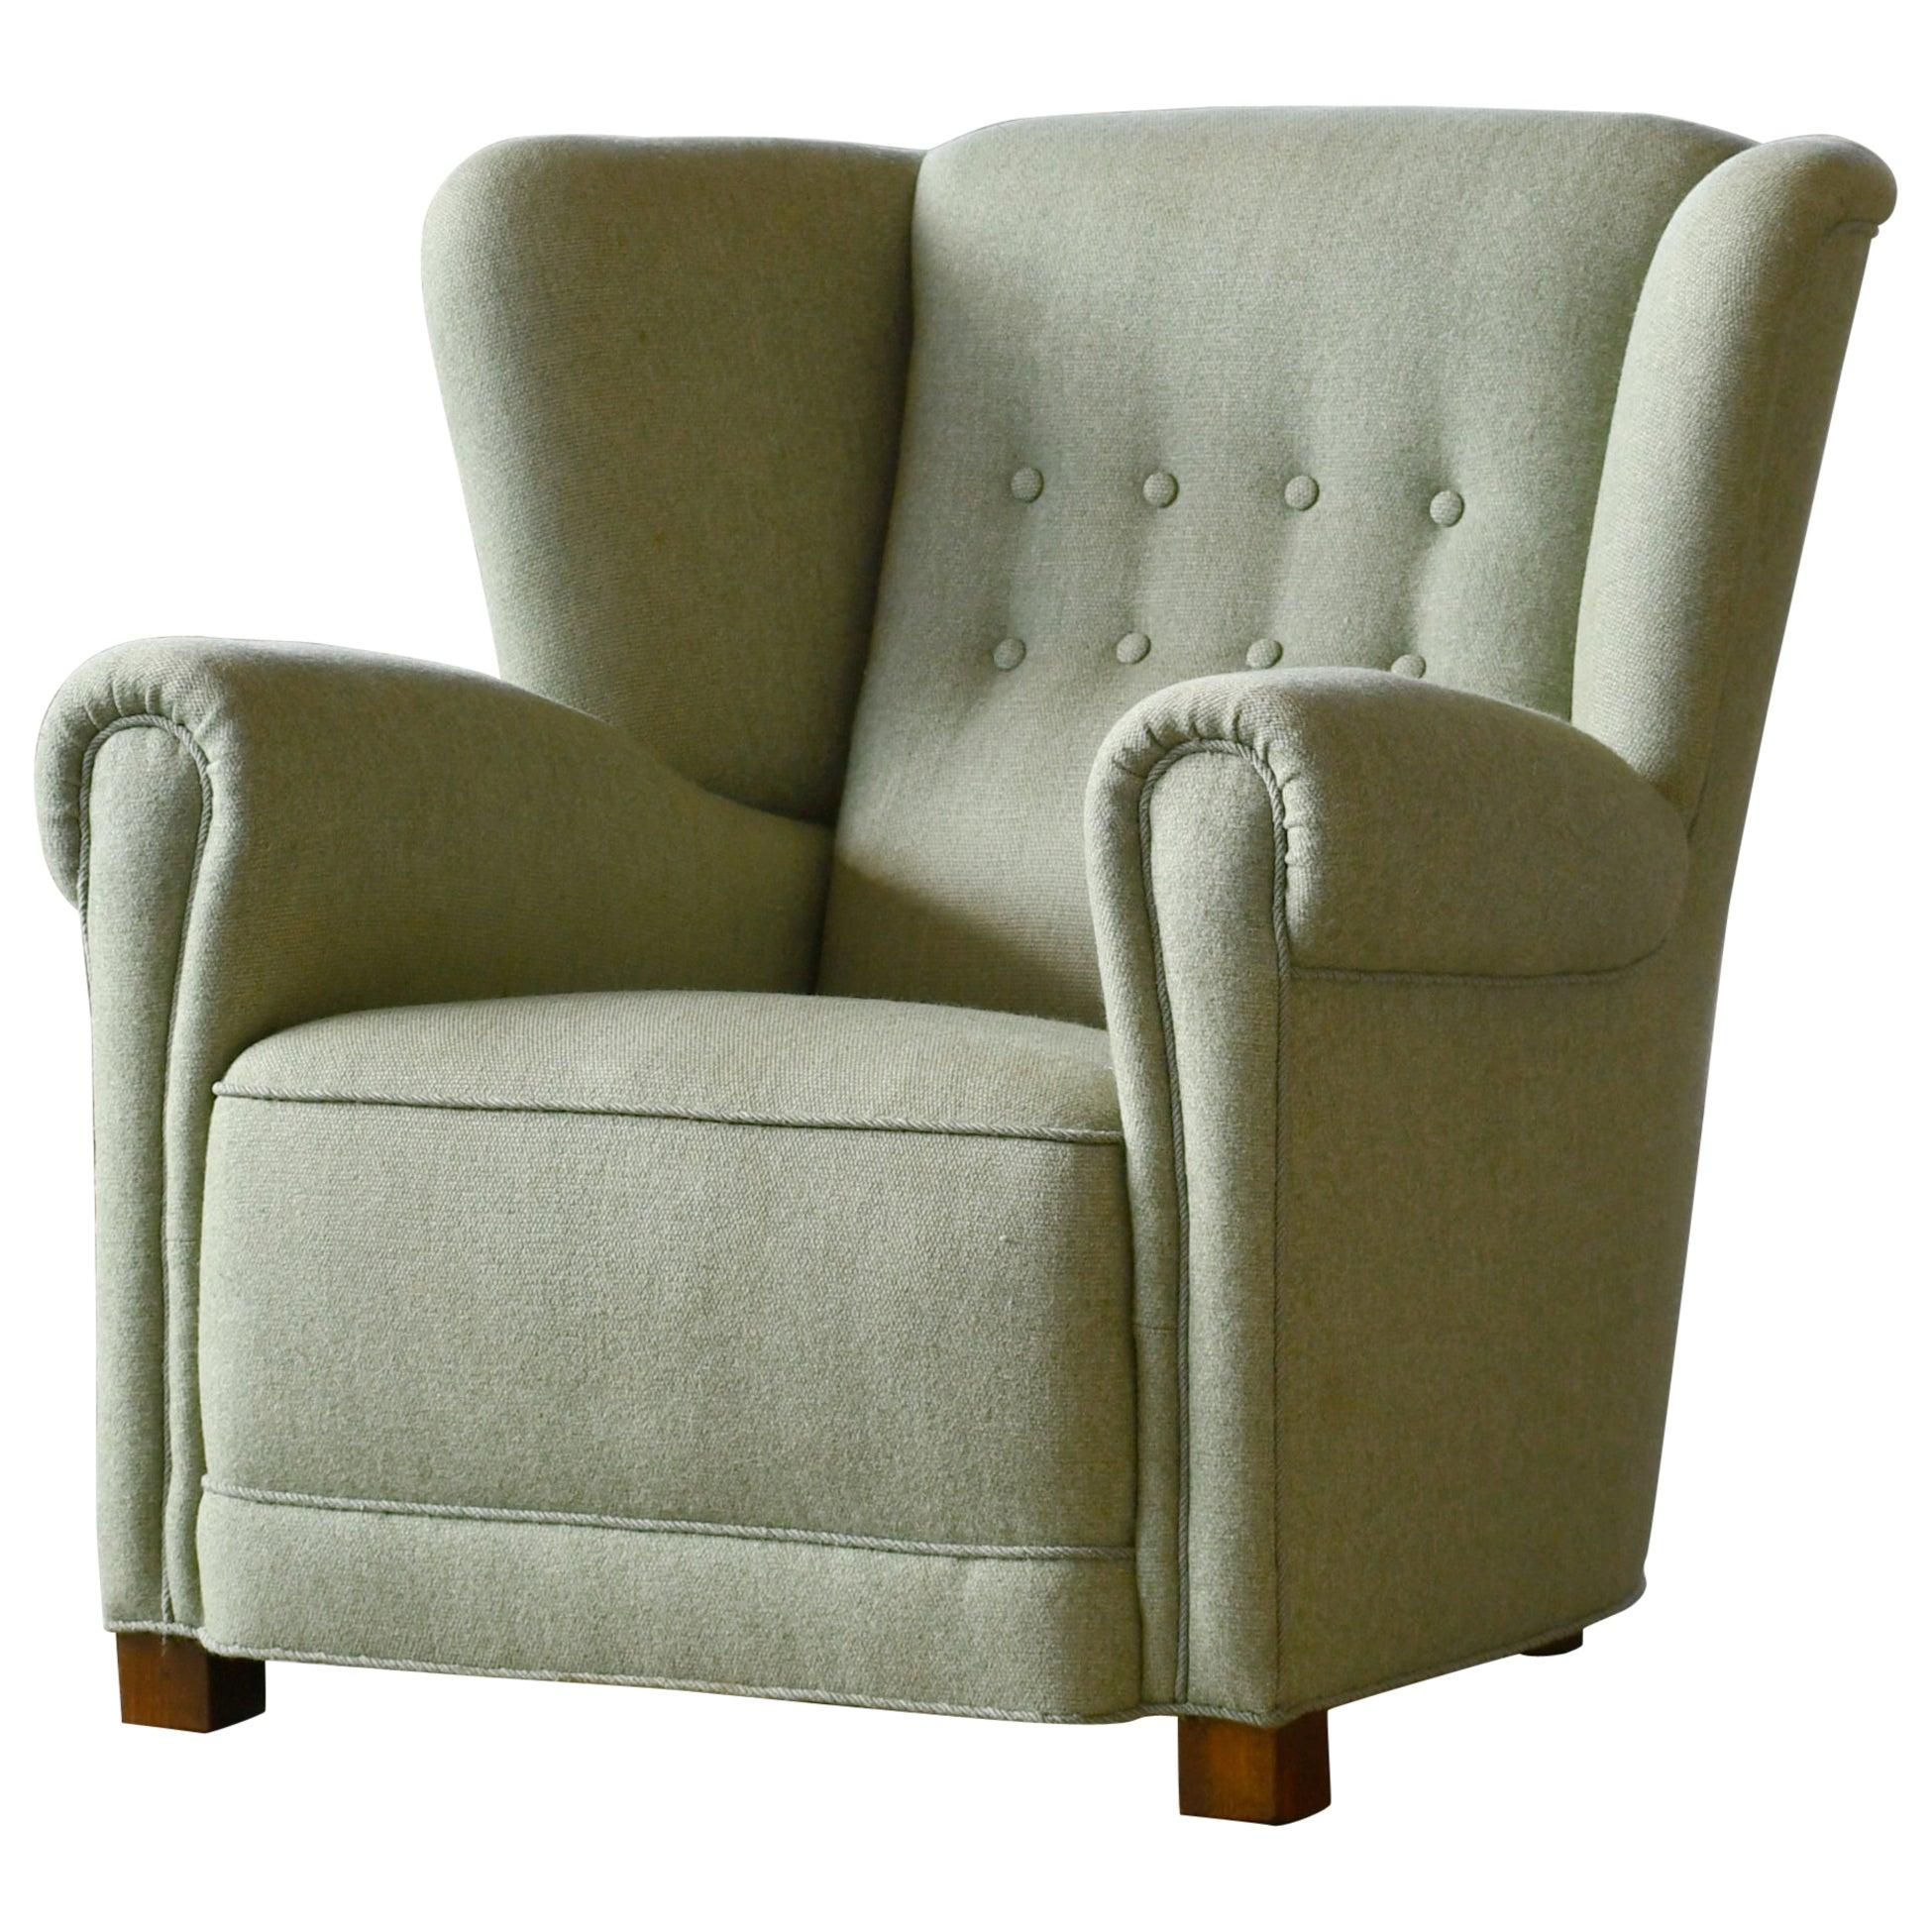 Danish 1940s Fritz Hansen Style Club or Lounge Chair